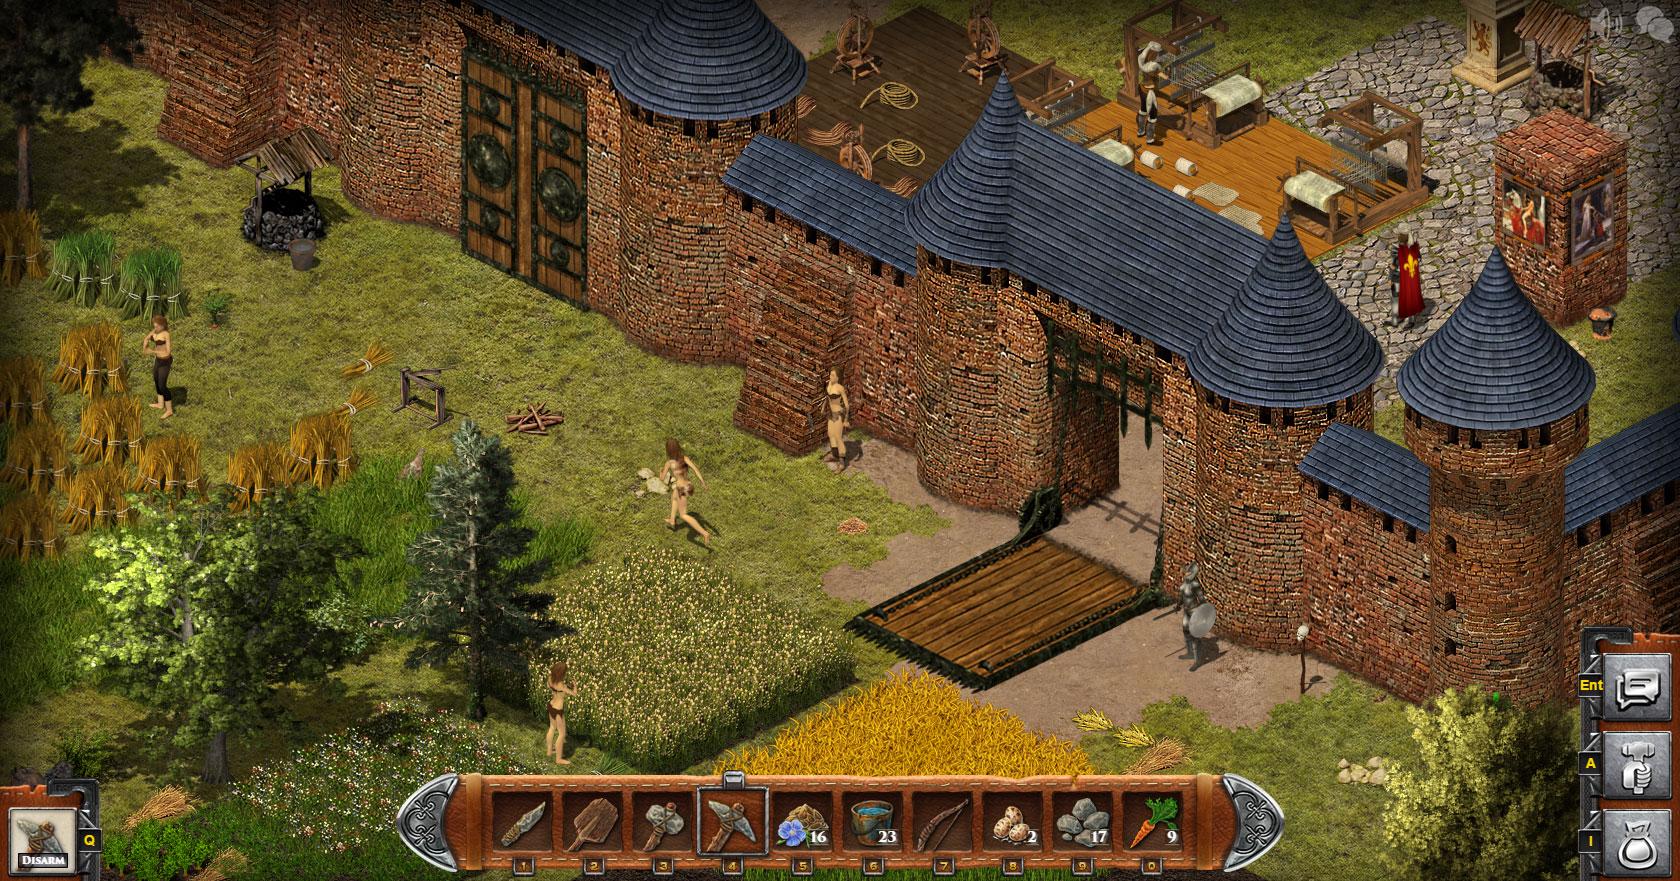 Free Online Home Decorating Games Update 0 7 16 News Wild Terra Indie Db